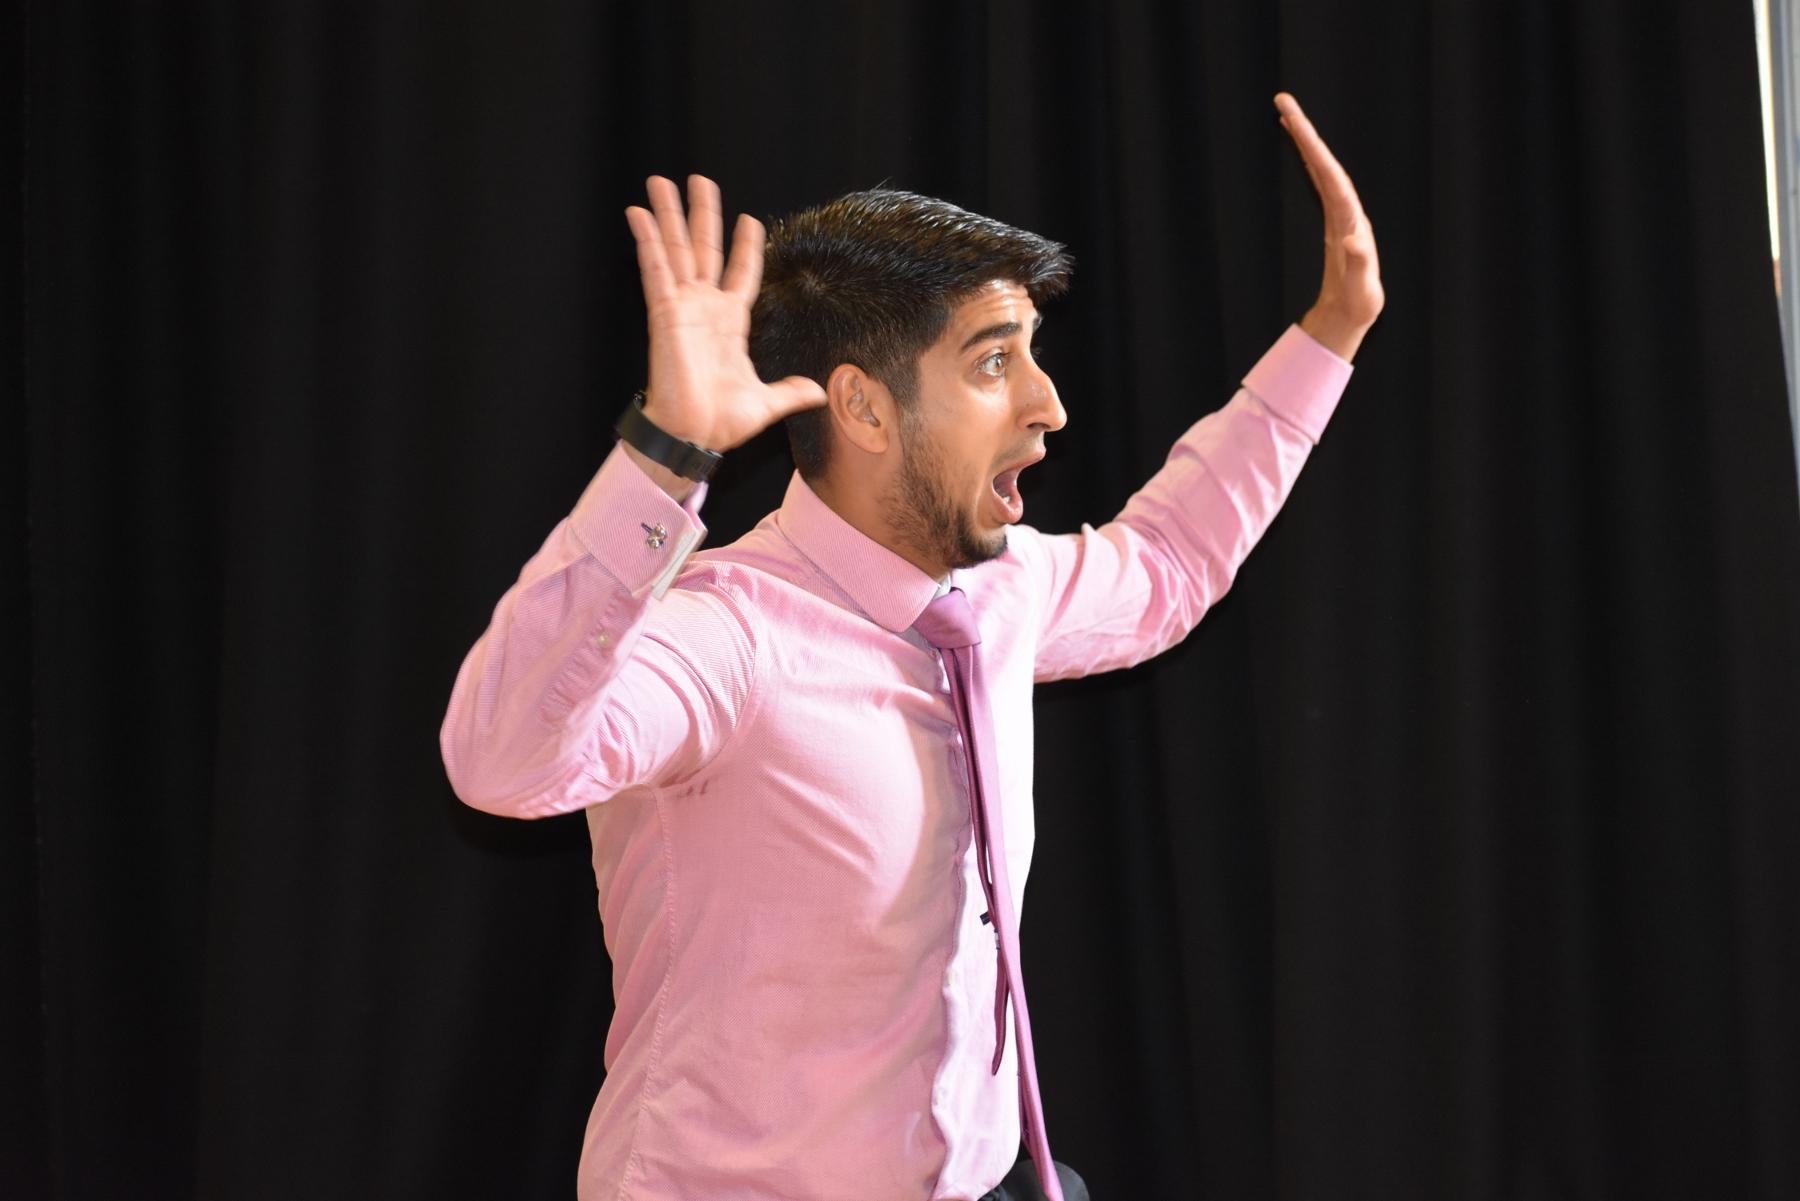 Sumair Hussain